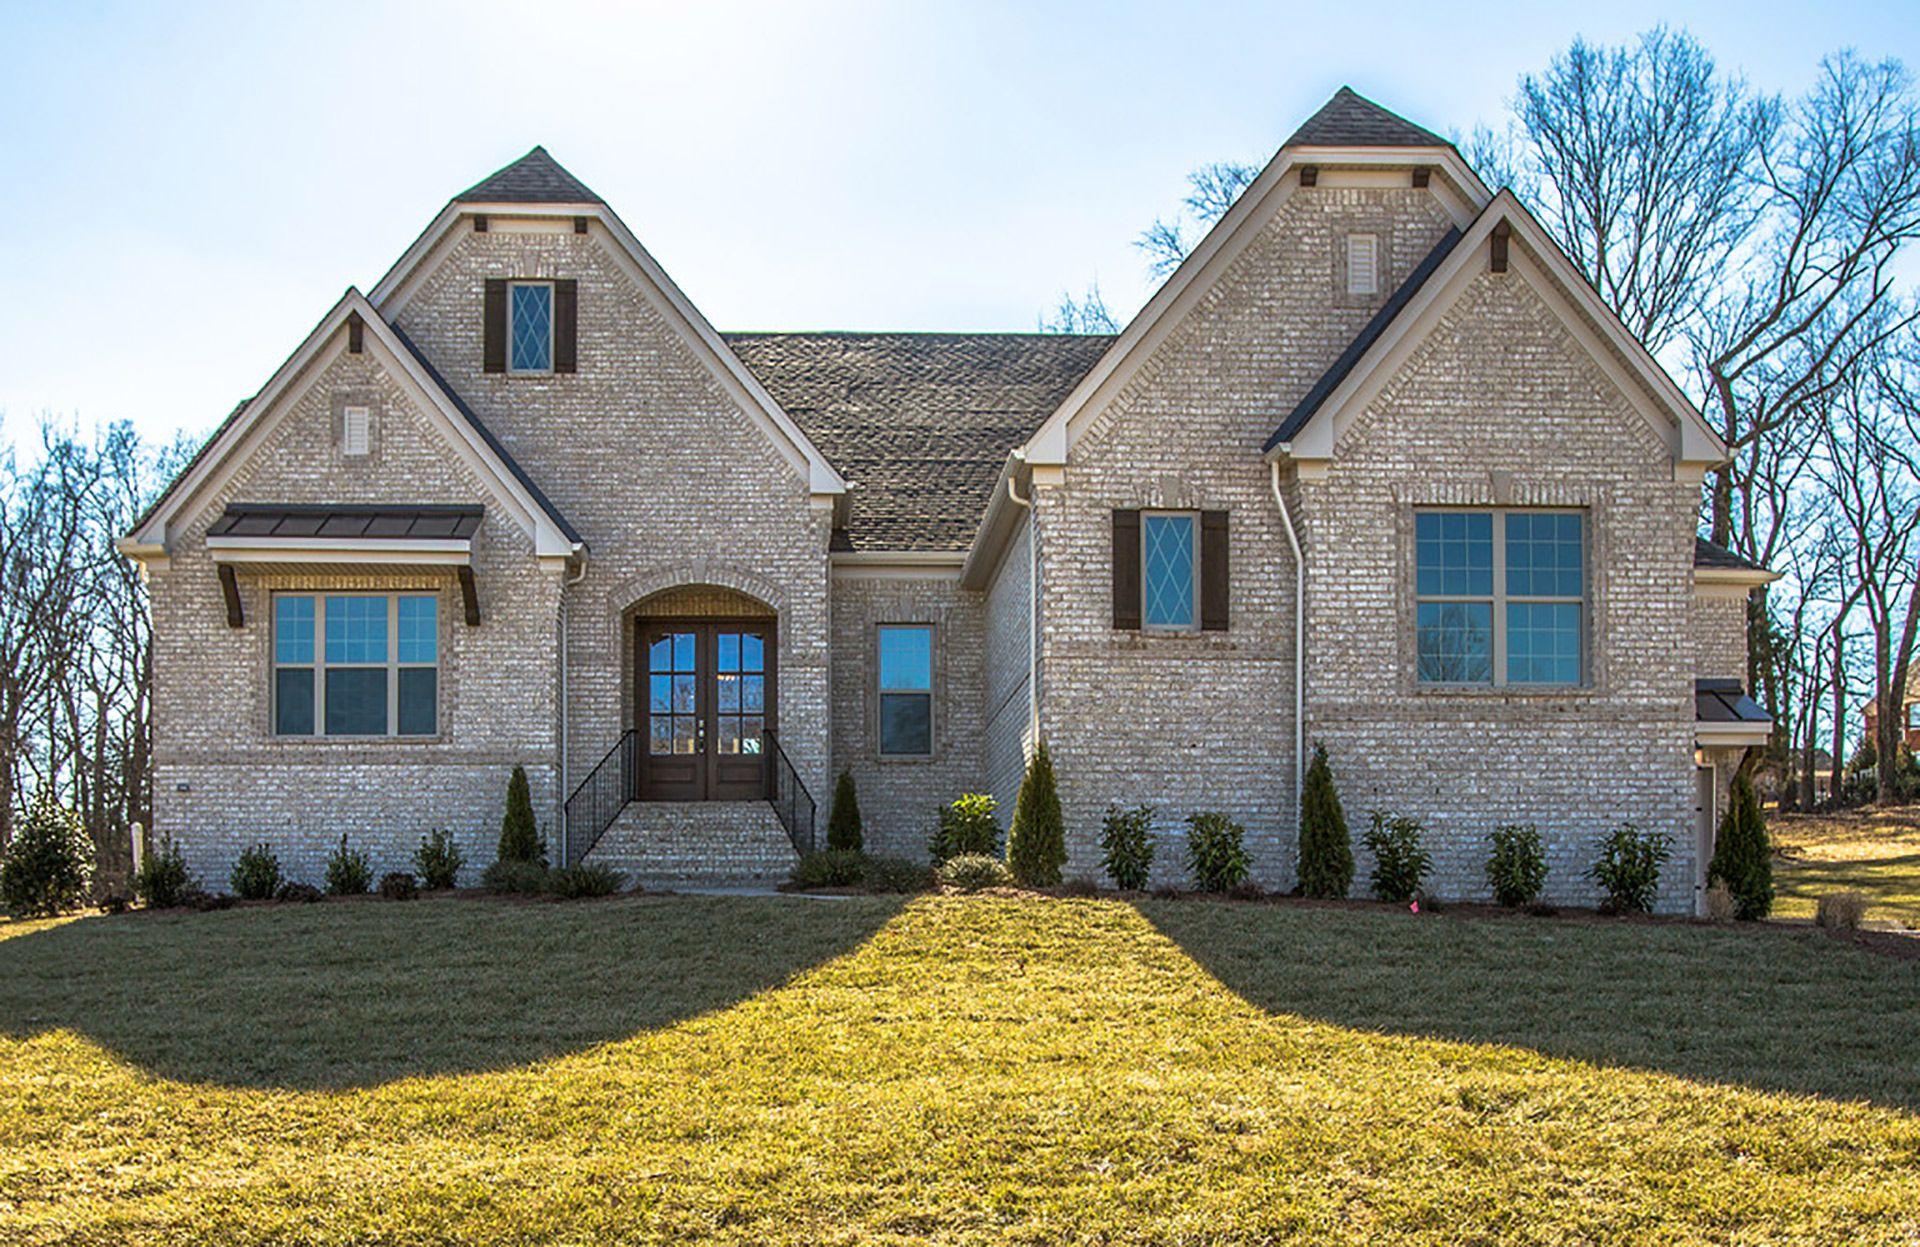 9483 Whetstone Blvd, Nashville - Green Hills, TN Homes & Land - Real Estate